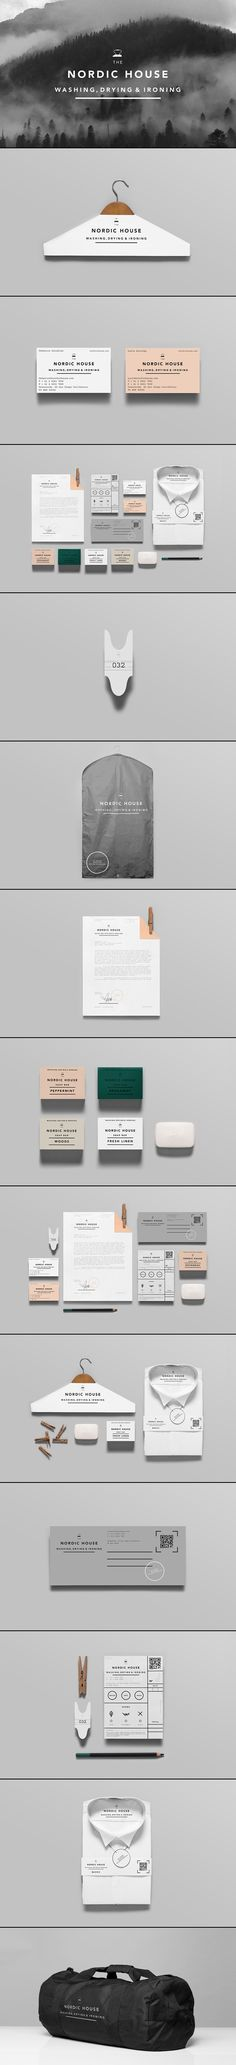 Nordic House | #stationary #corporate #design #corporatedesign #identity #branding #marketing < repinned by www.BlickeDeeler.de | Take a look at www.LogoGestaltung-Hamburg.de